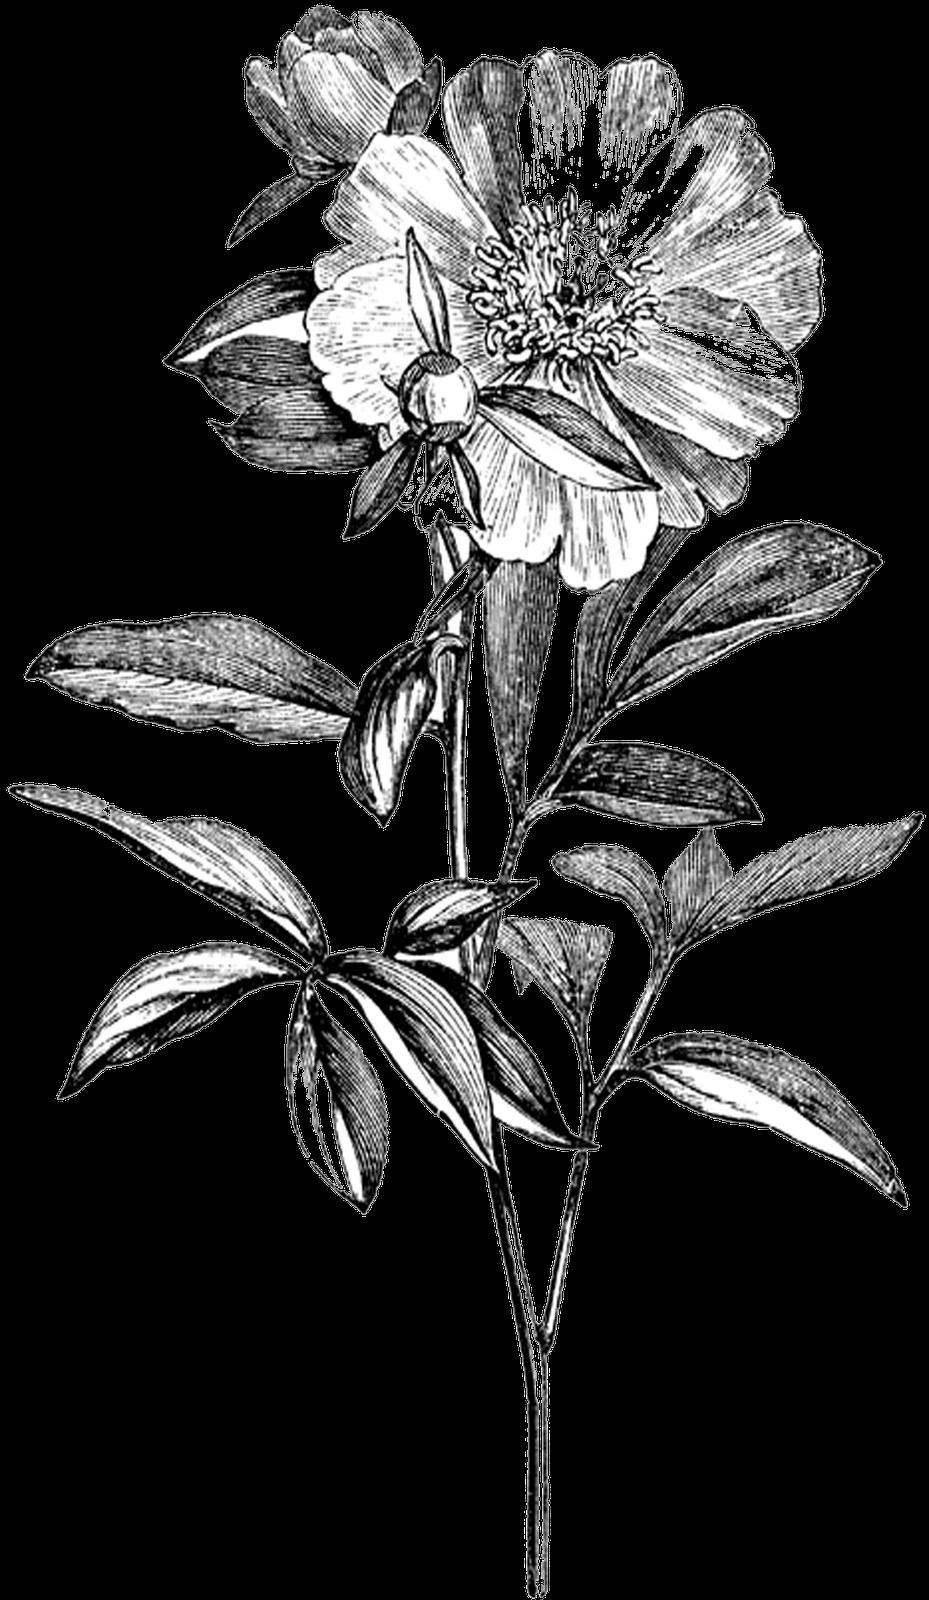 Transparent Black And White Flowers Tumblr